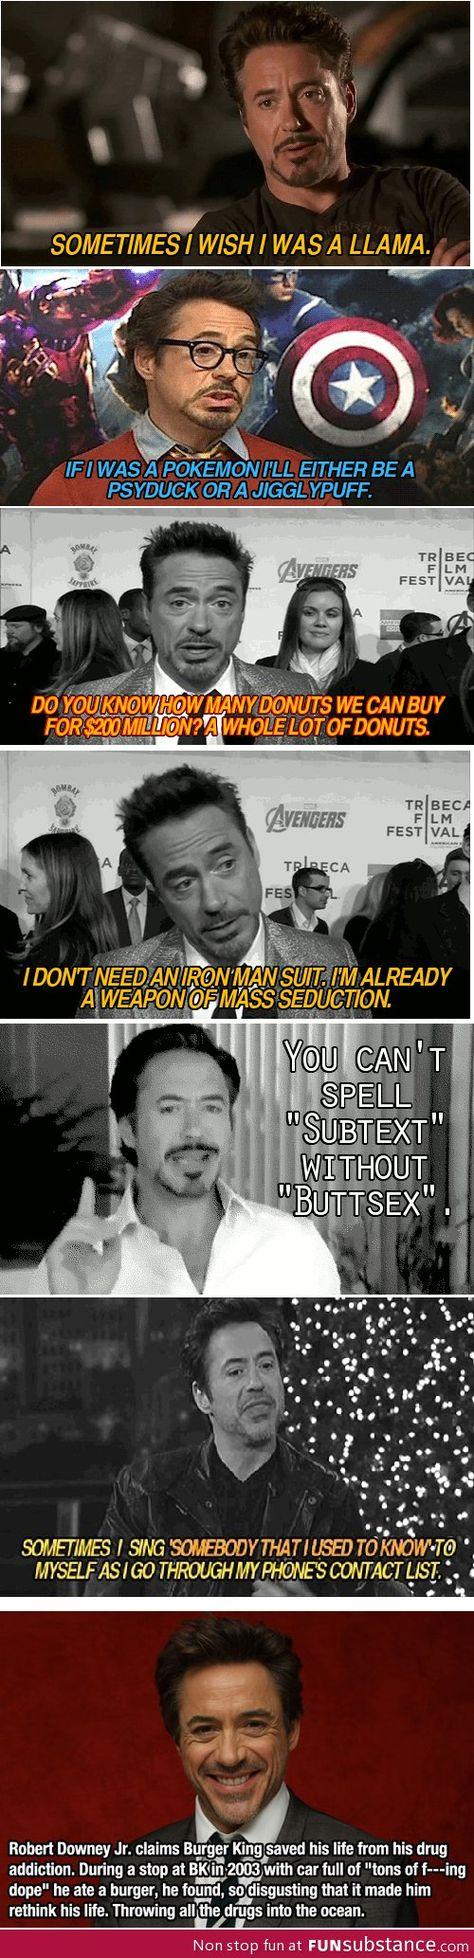 I Love Robert Downey Jr